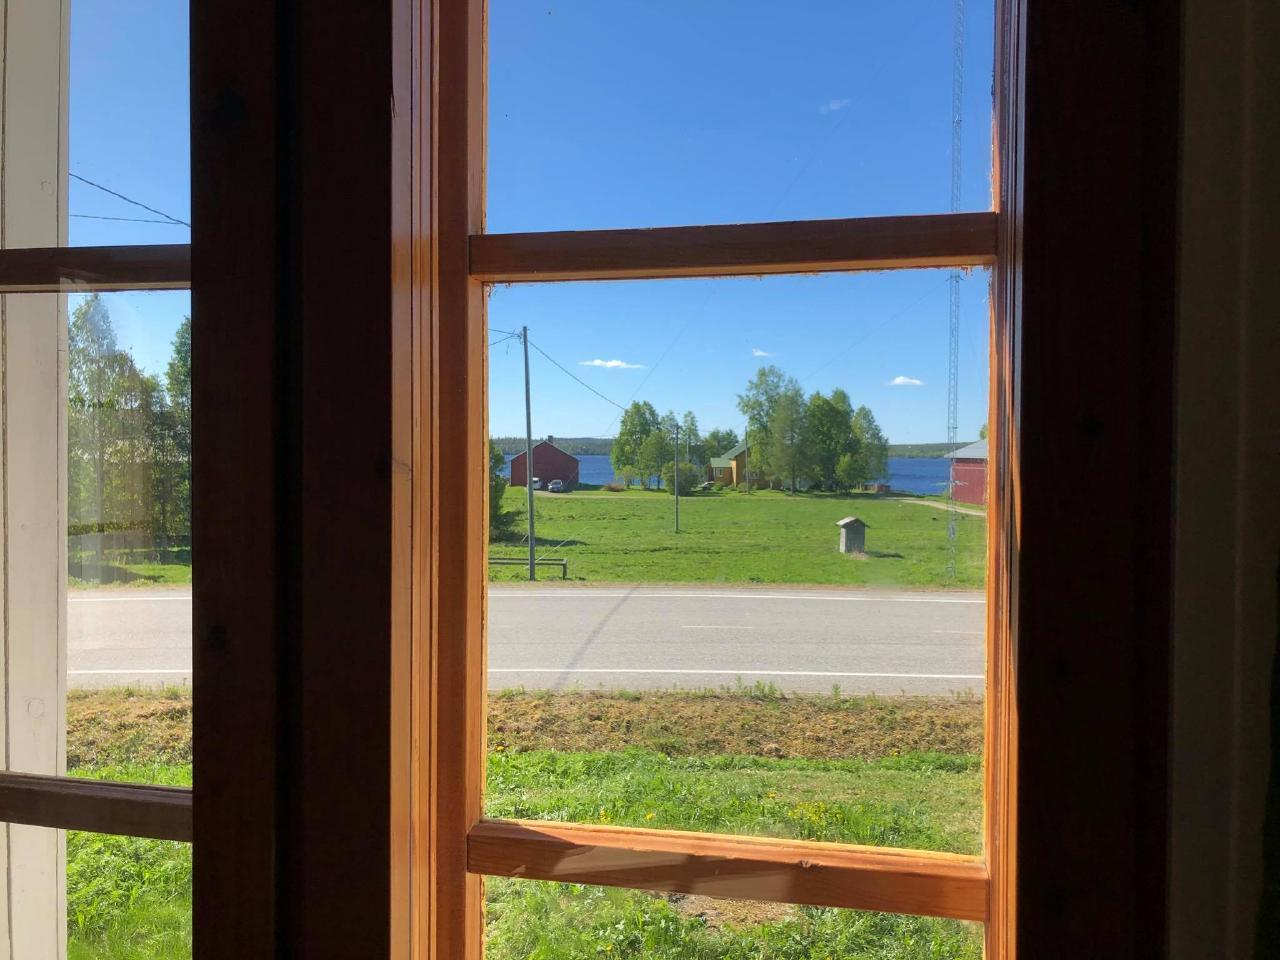 Maison de vacances Urlaub in der schönsten Gegend Finnlands (2177850), Suomussalmi, , Centre de la Finlande - Oulu, Finlande, image 13